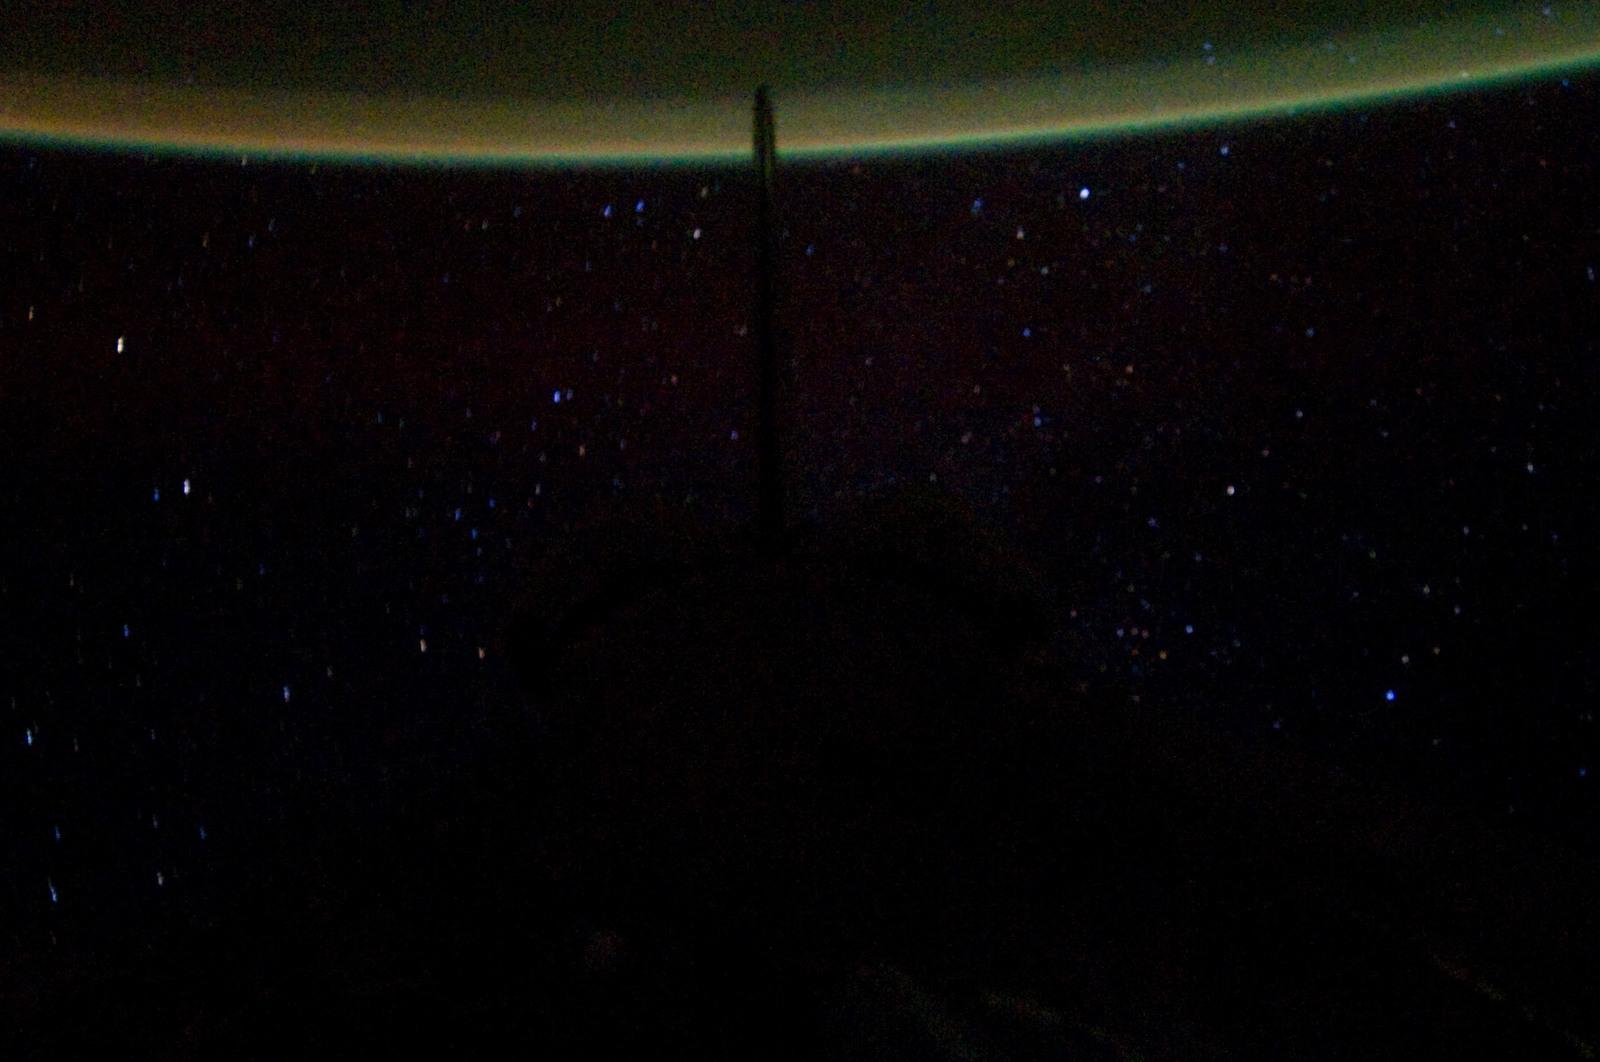 S134E012331 - STS-134 - Earth Observation taken from Aft Flight Deck Window